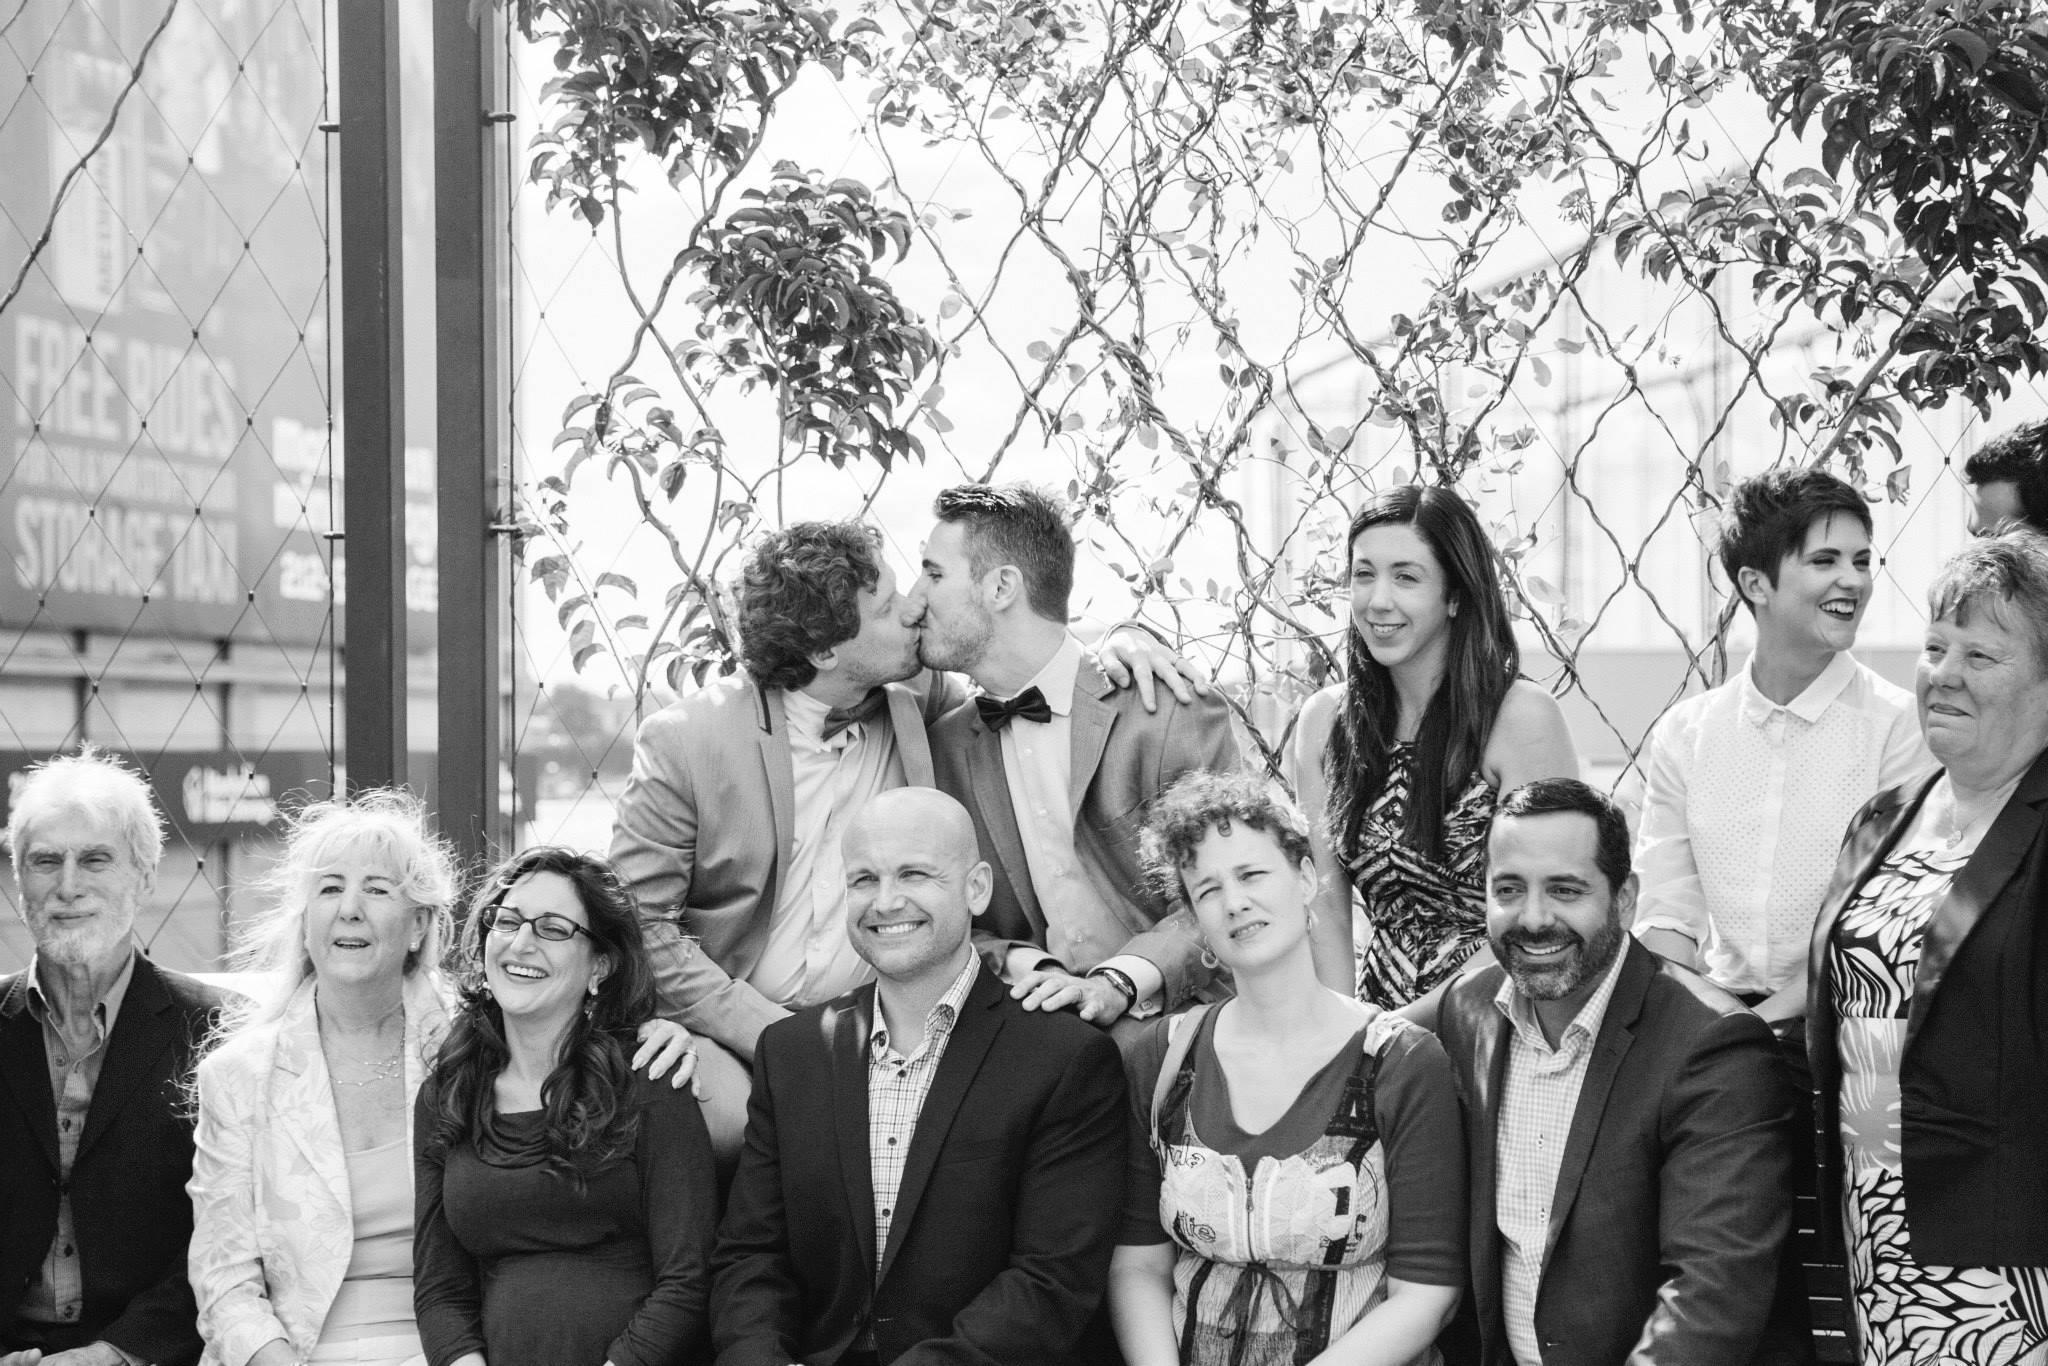 new-york-city-civil-wedding-photo-19.jpg